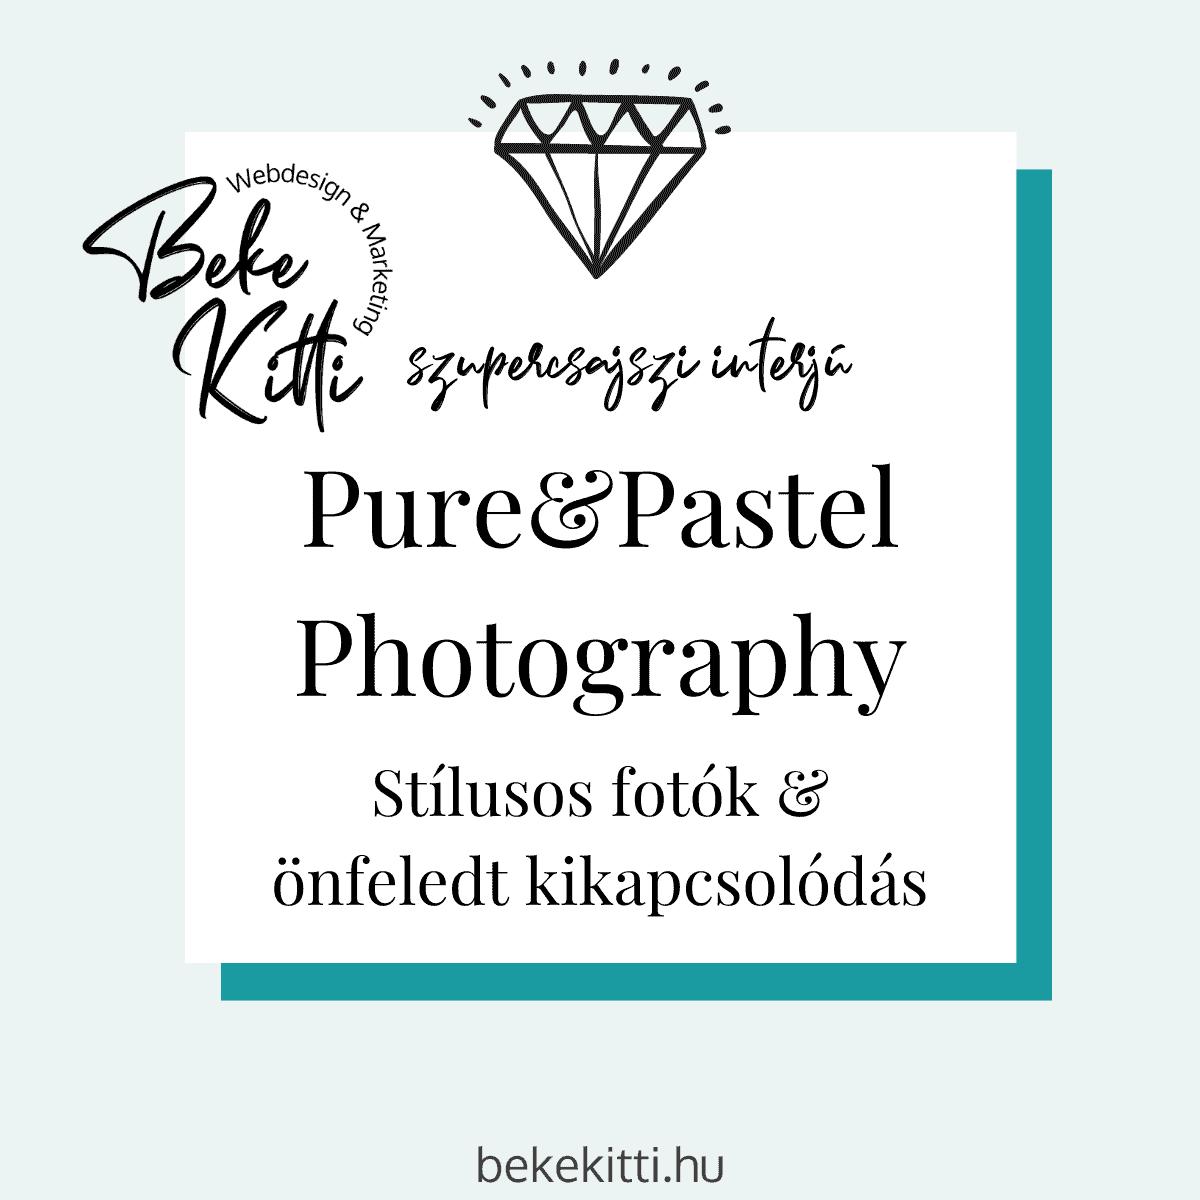 Szupercsajszi Interju Pure Pastel Fotos Beke Kitti Borito 1